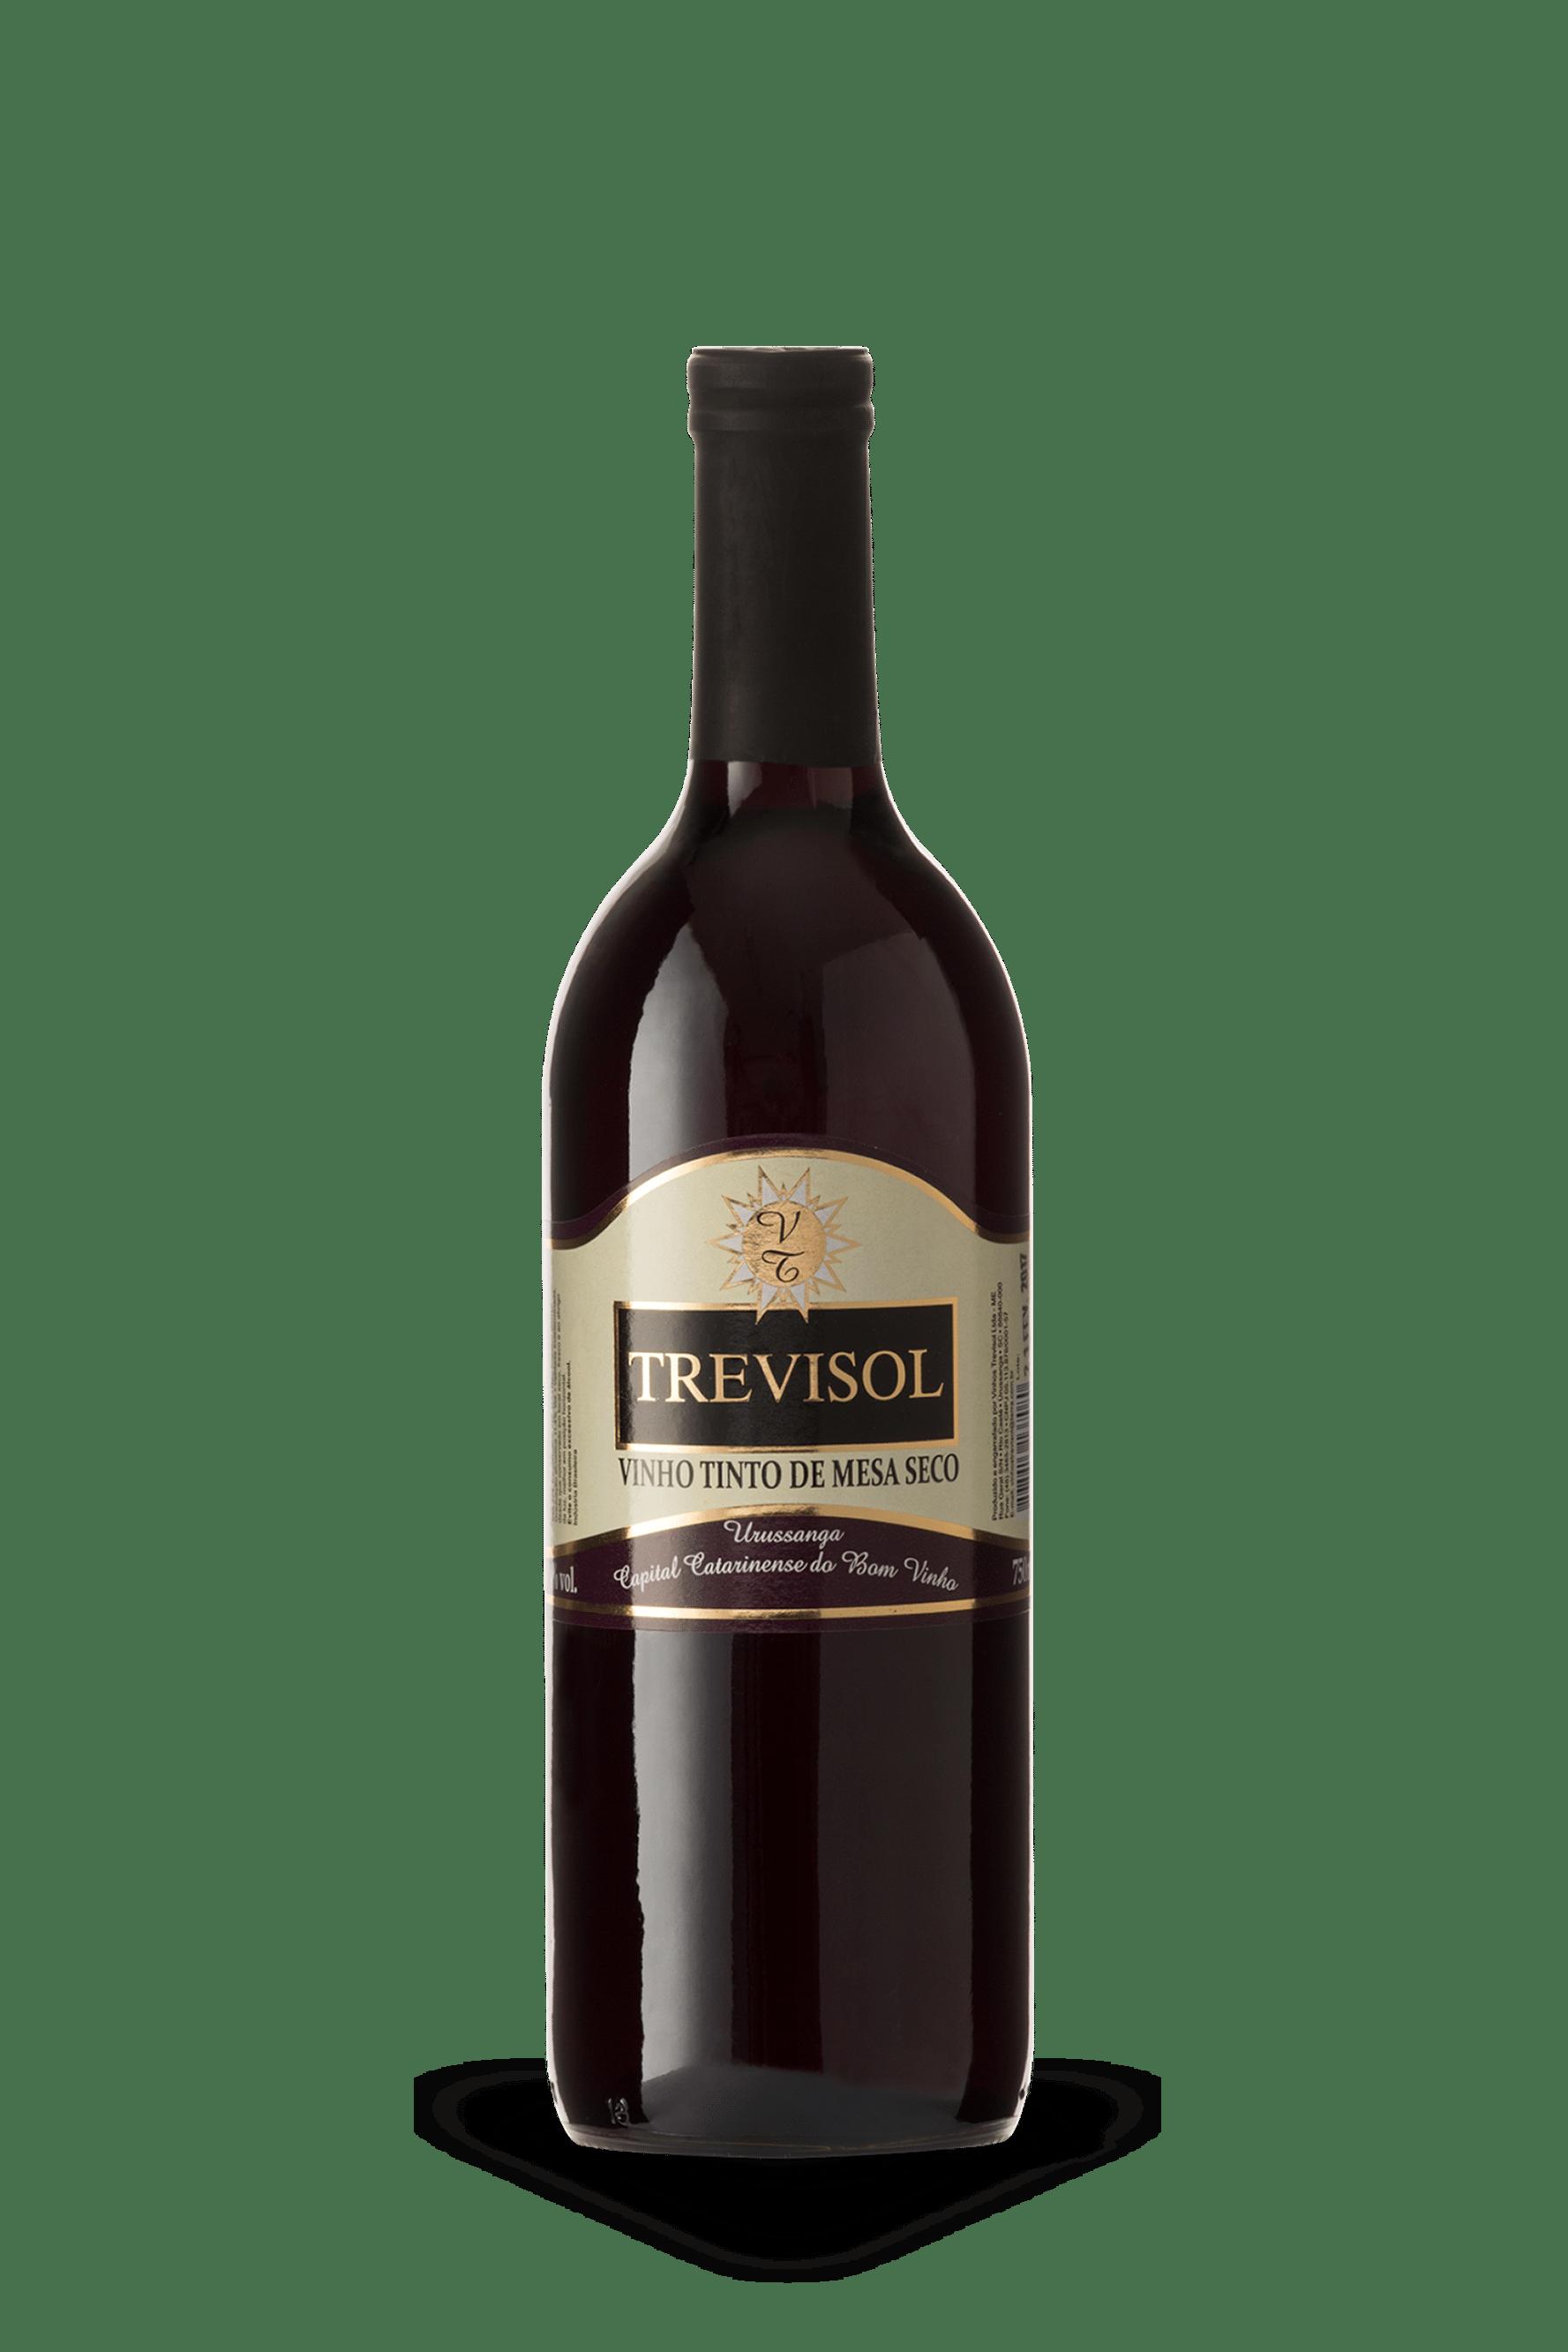 Vinho Trevisol Seco